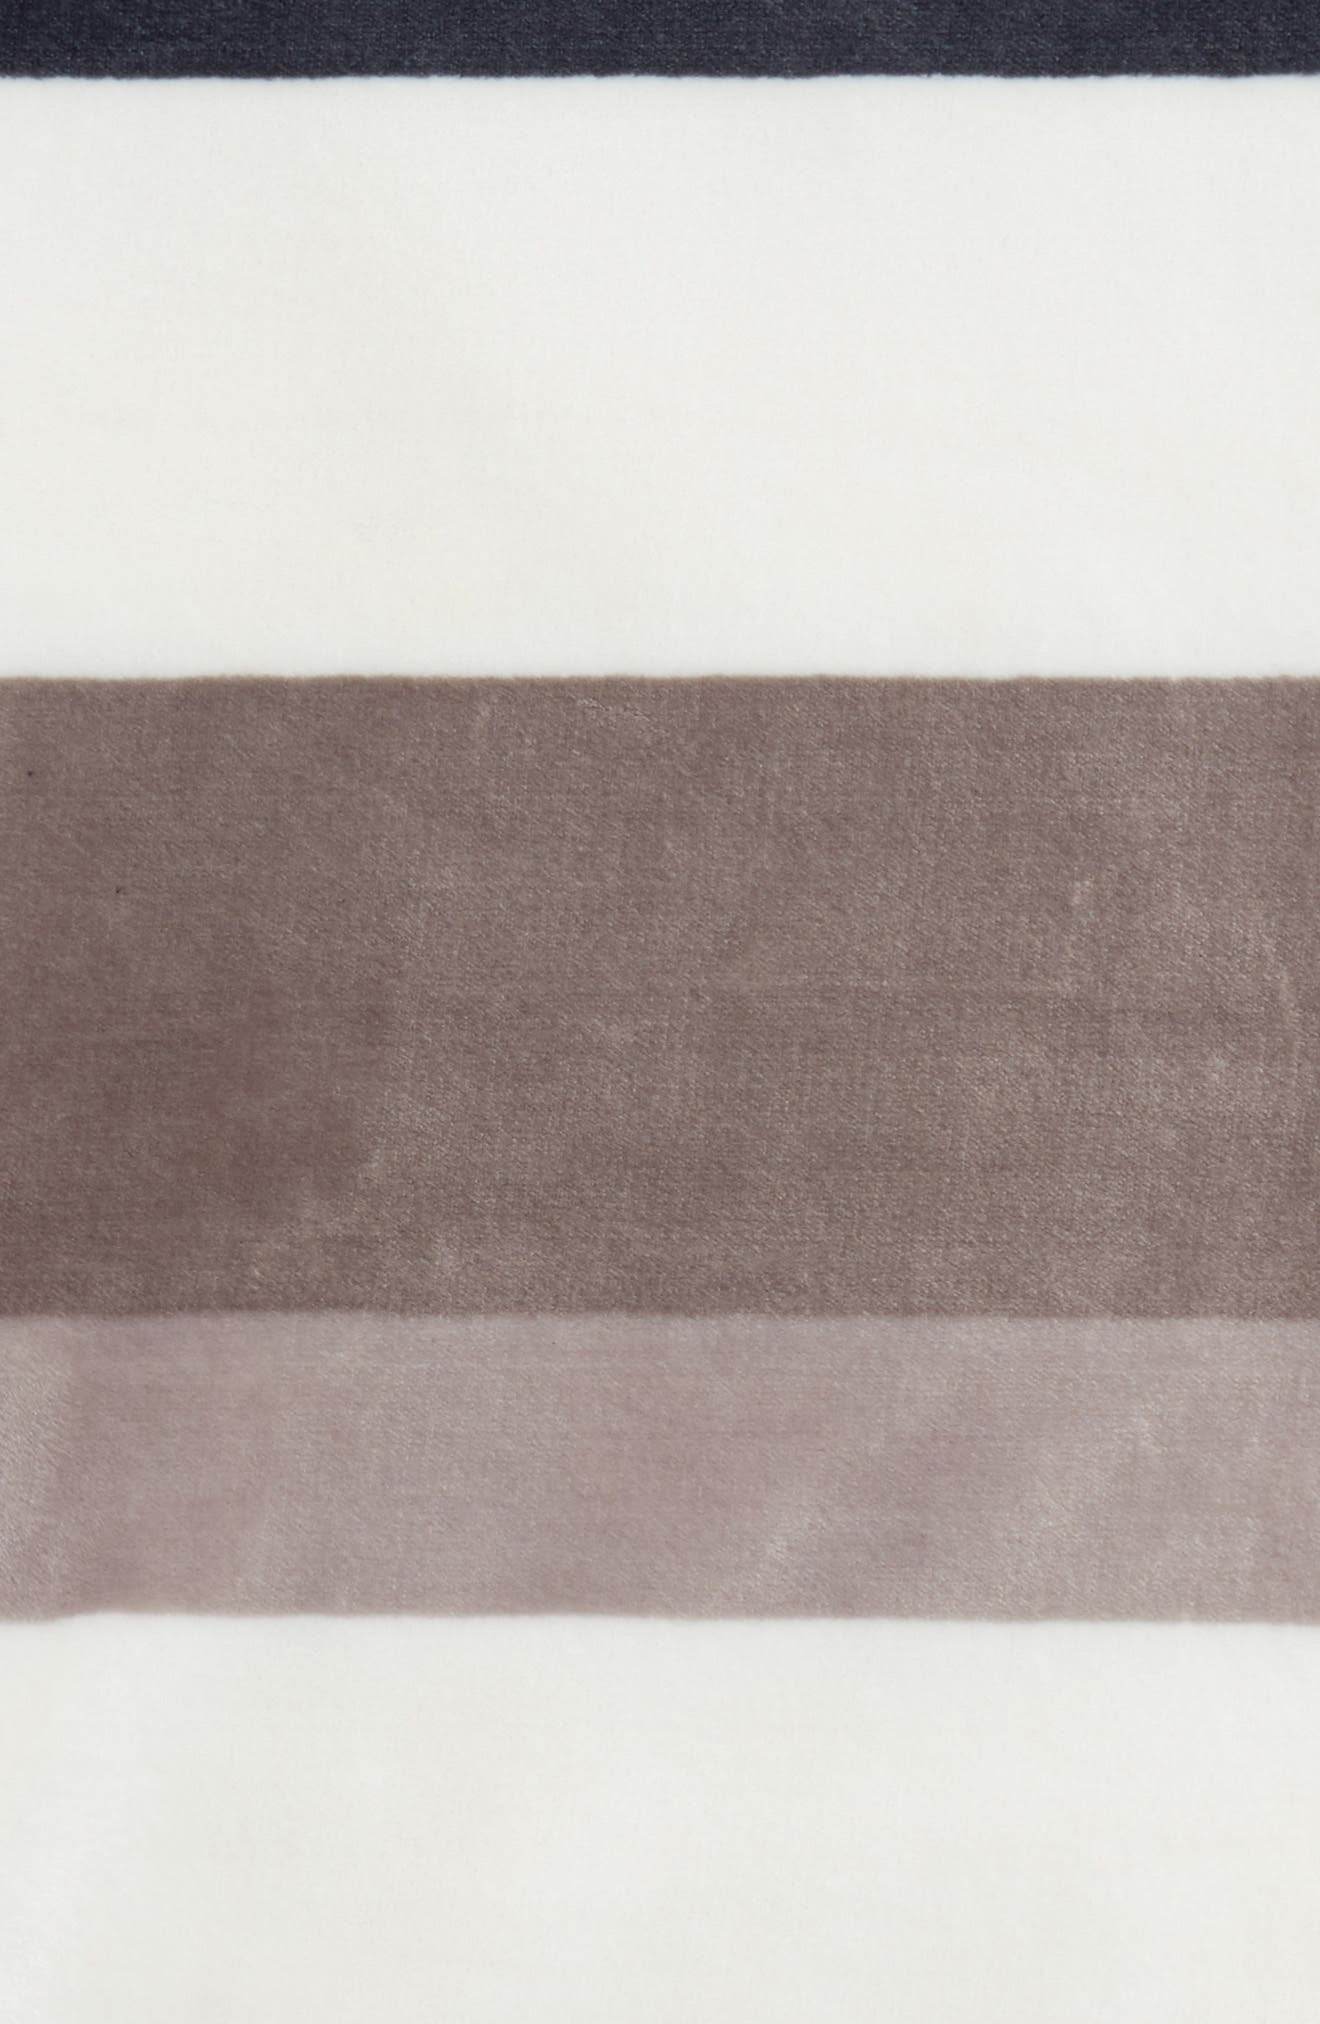 Tonal Stripe Plush Throw,                             Alternate thumbnail 2, color,                             020